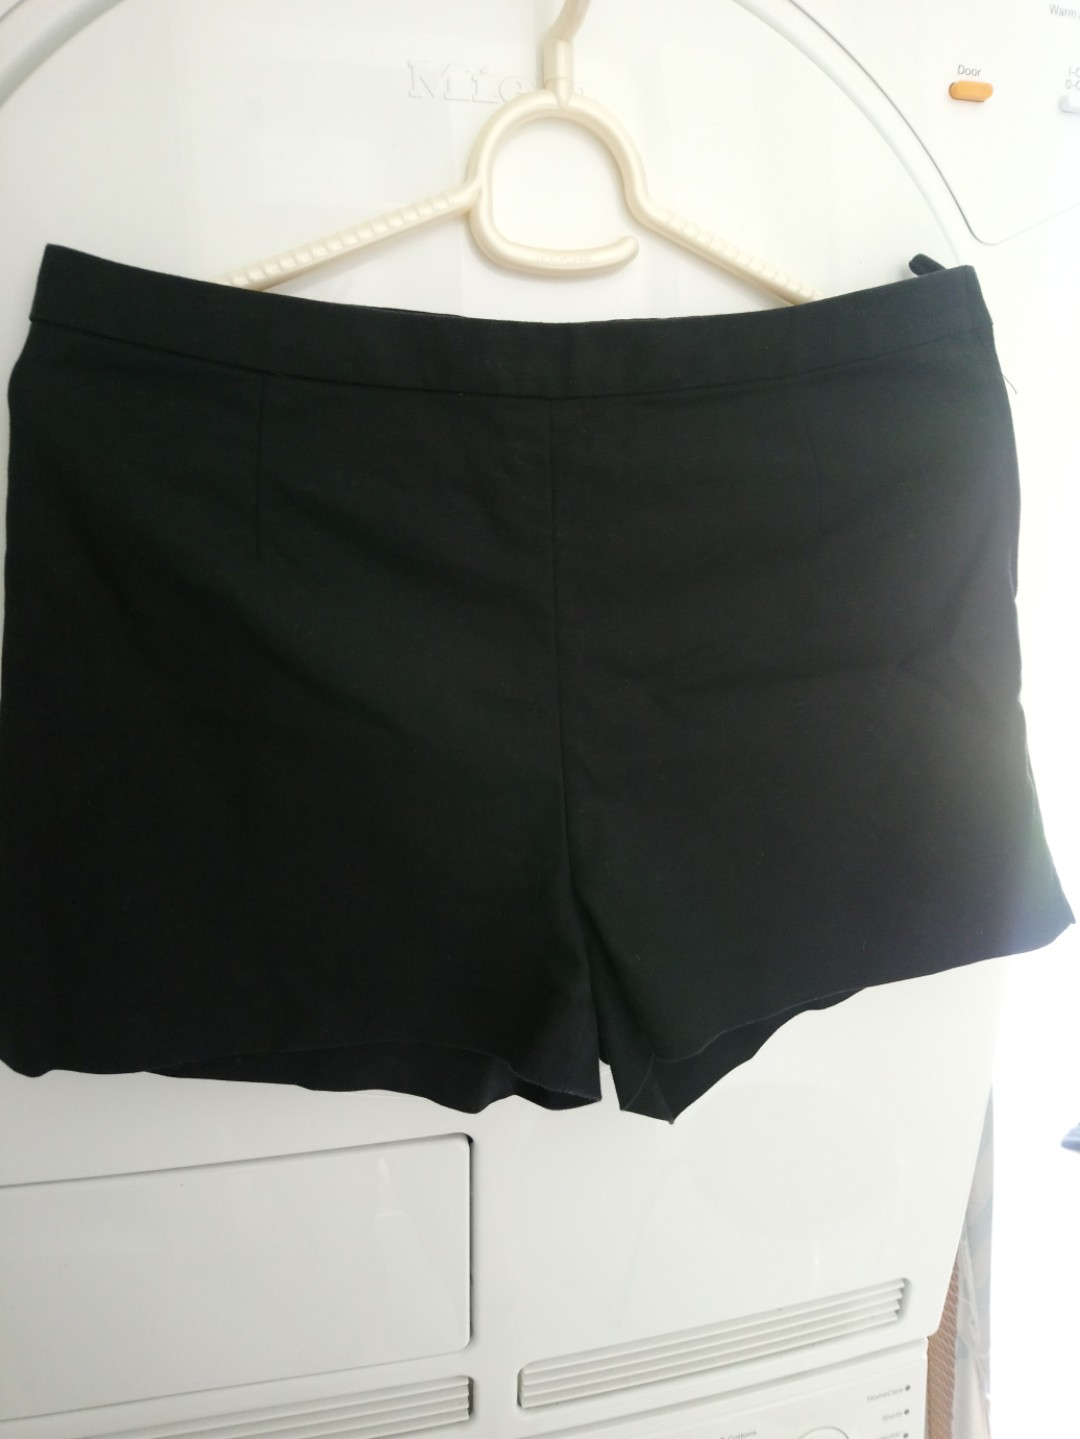 BNWT New Look Black /& White Stripe Tie High Waist Shorts UK 10 EU 38 Casual